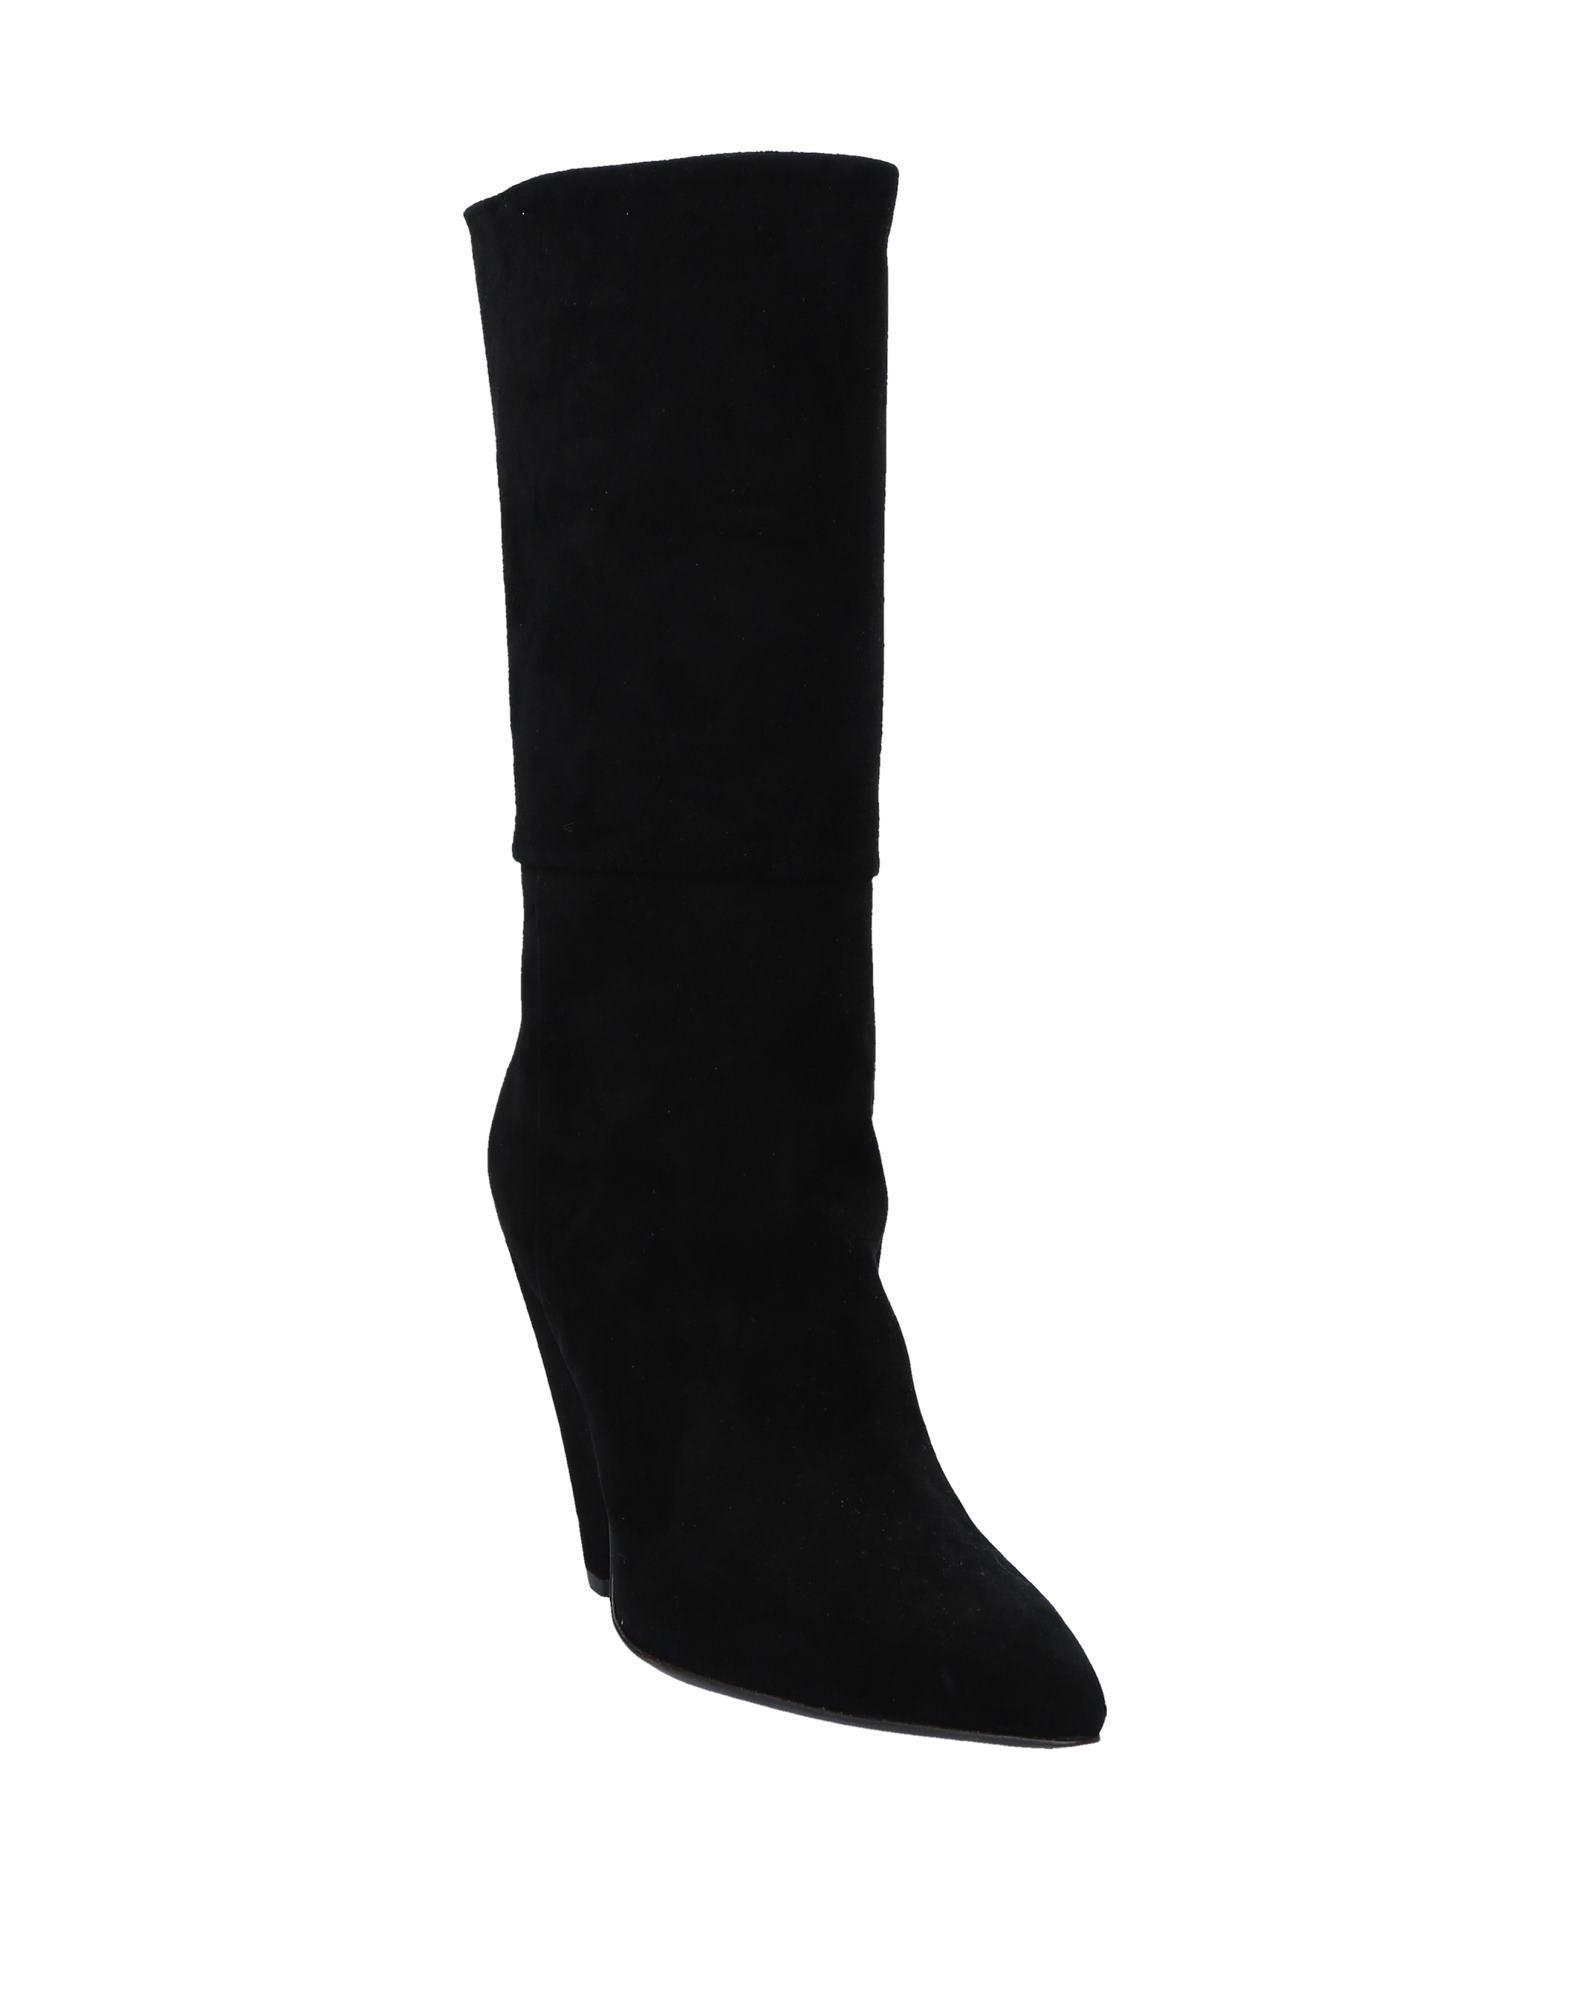 Giampaolo Viozzi Stiefel  Damen  Stiefel 11550085OI 69af97